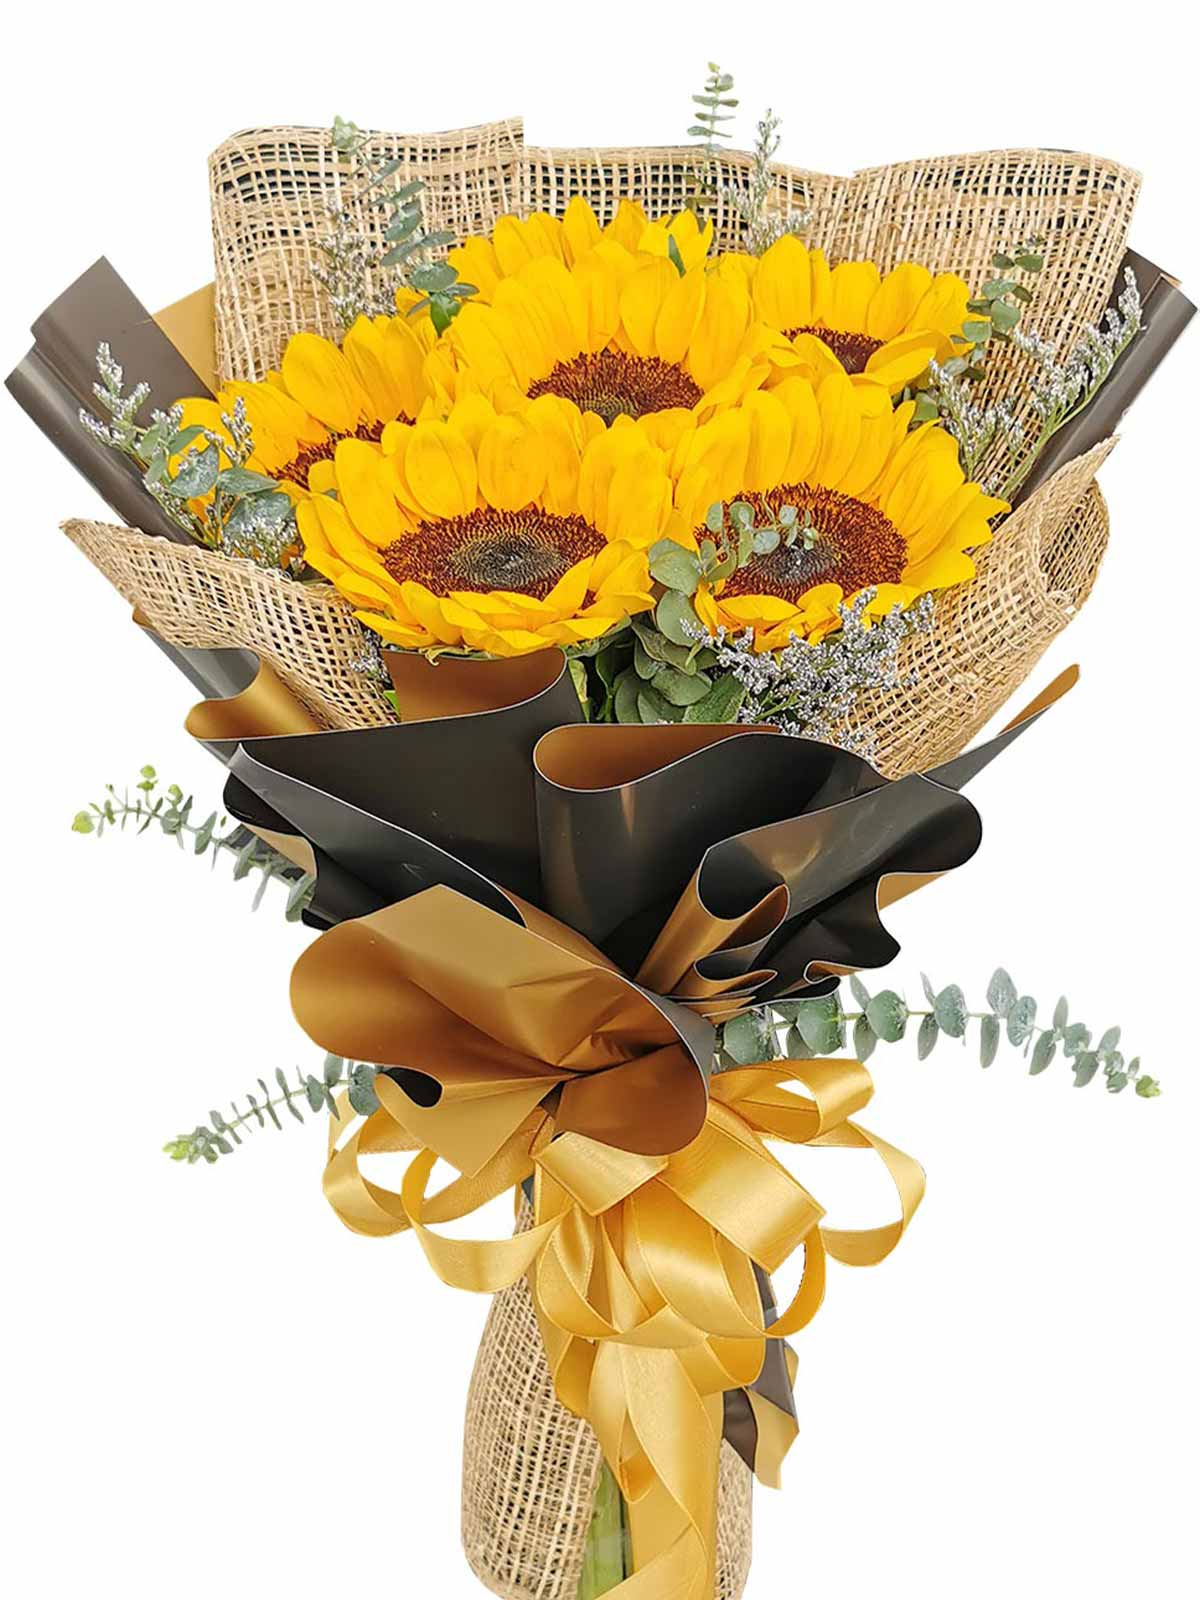 Sunflower Burlap BG 6